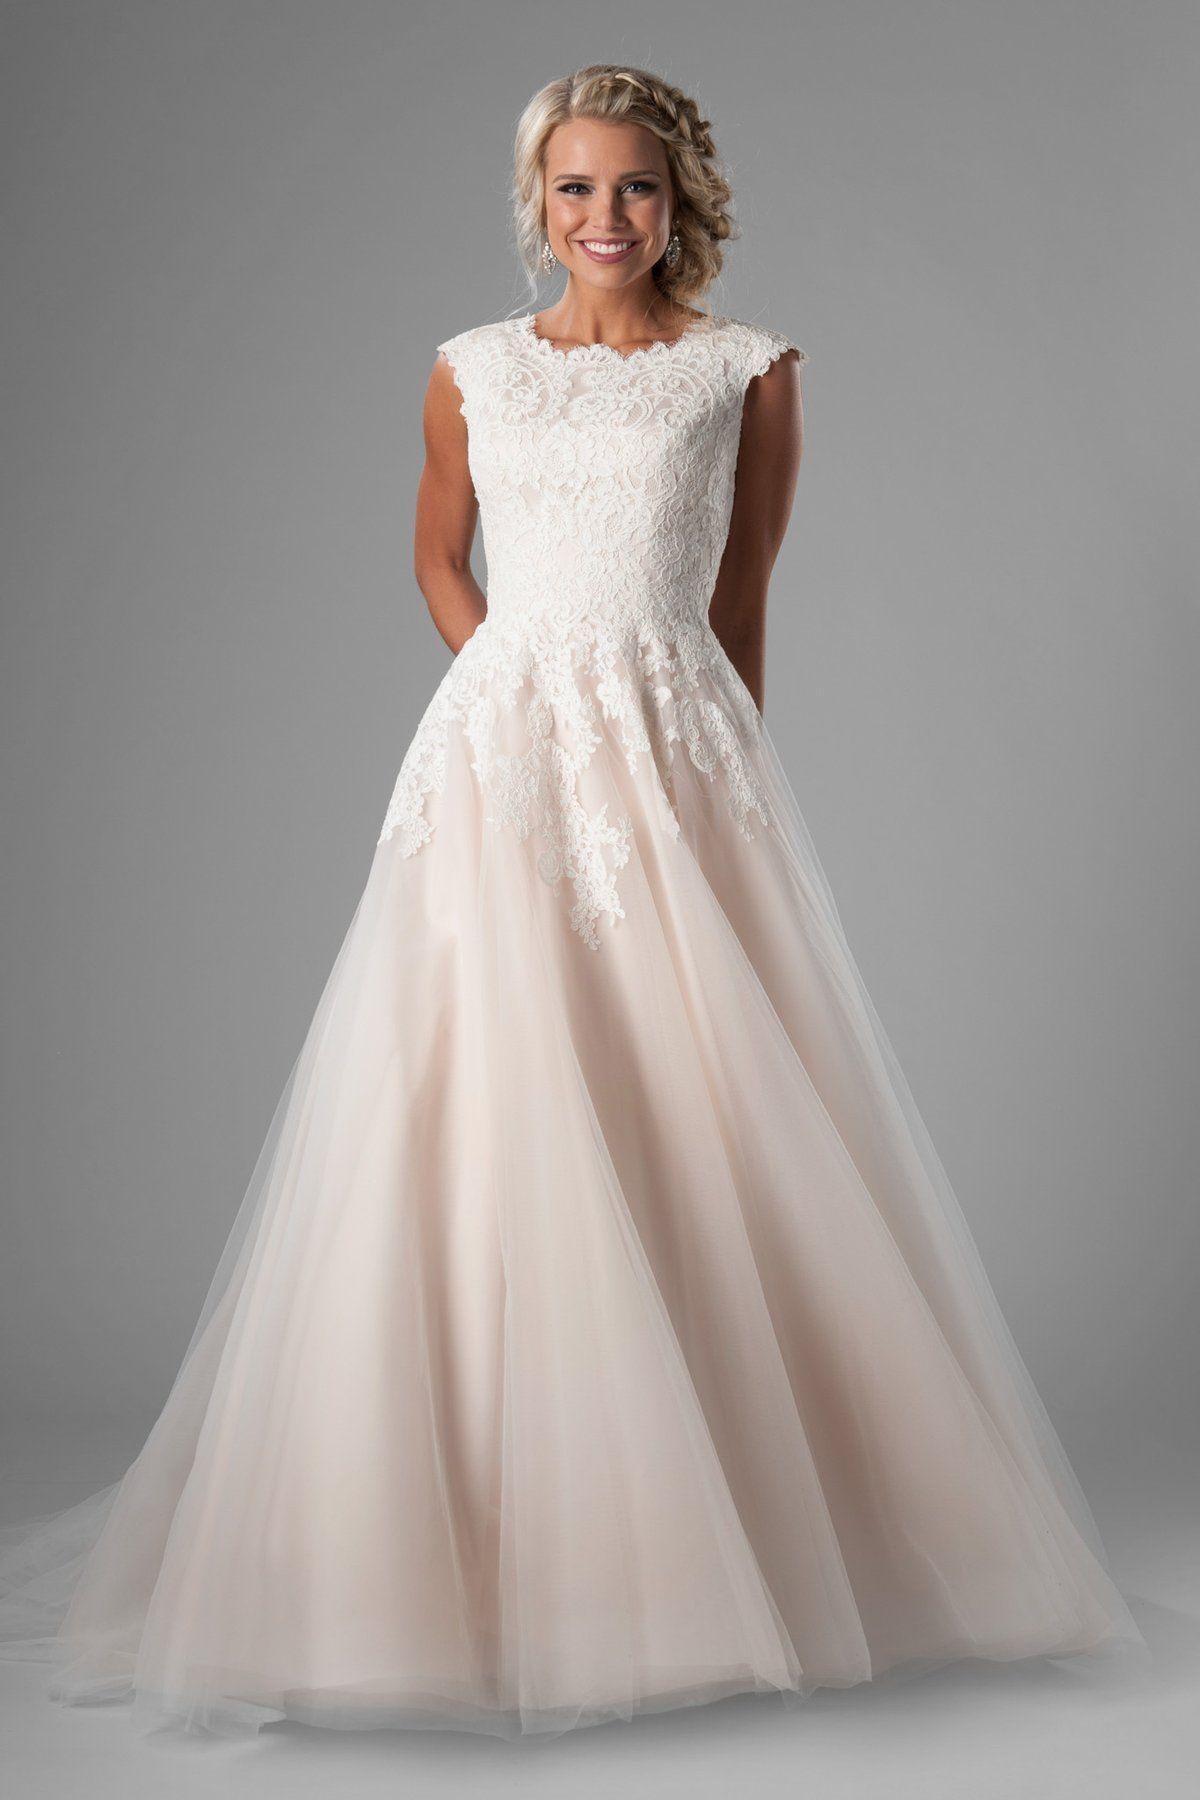 43+ Plus size wedding dresses under 1000 information